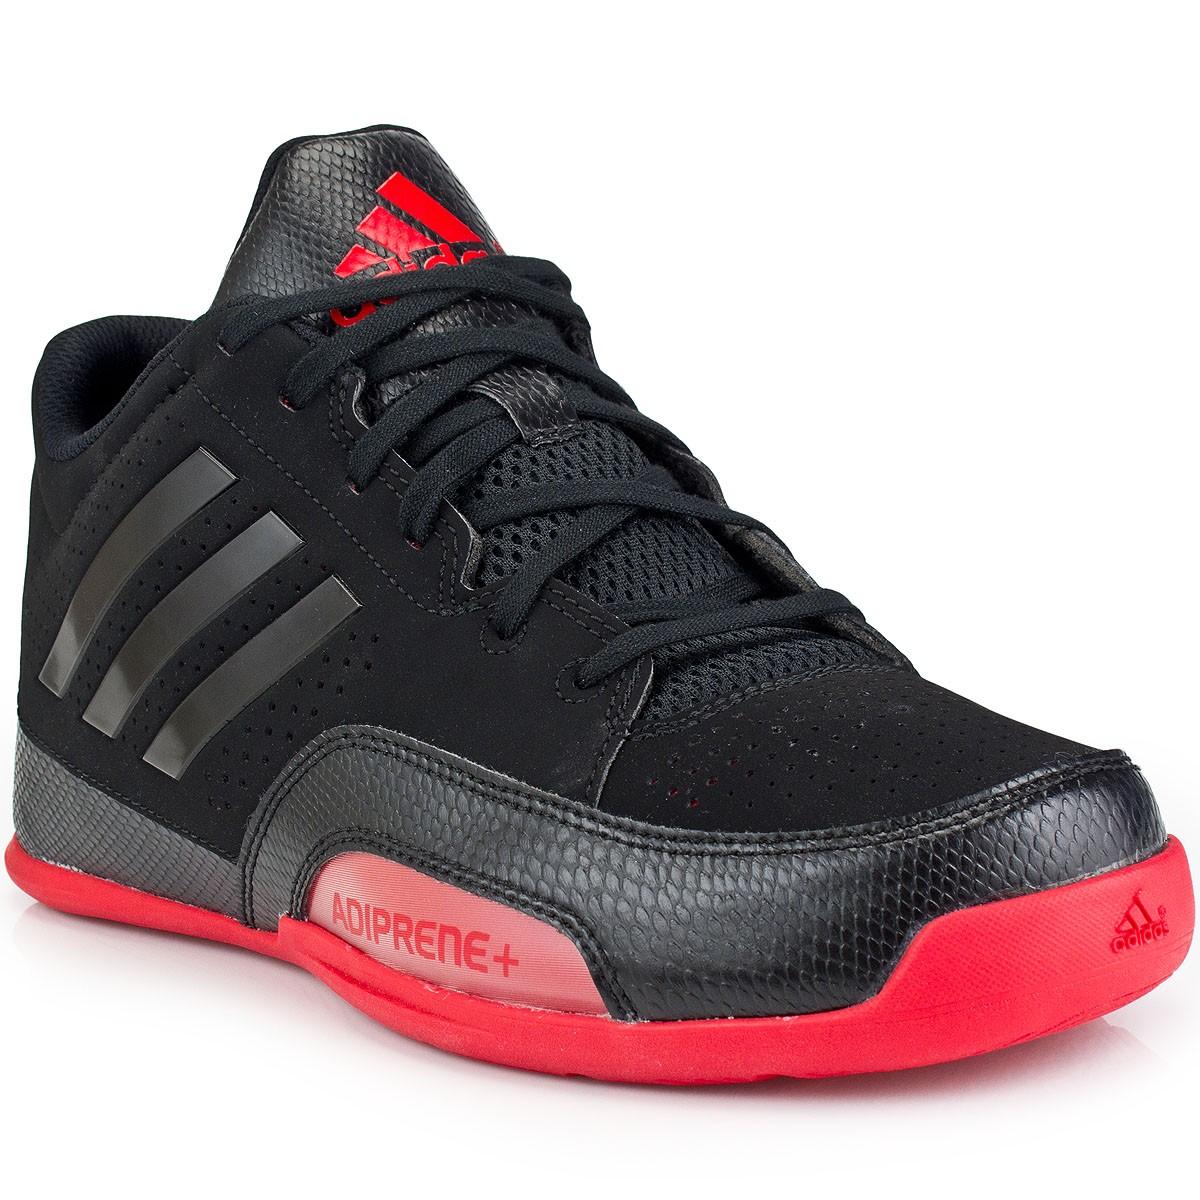 ee8c5ebc94bd1 Tênis Adidas 3 Series 2015